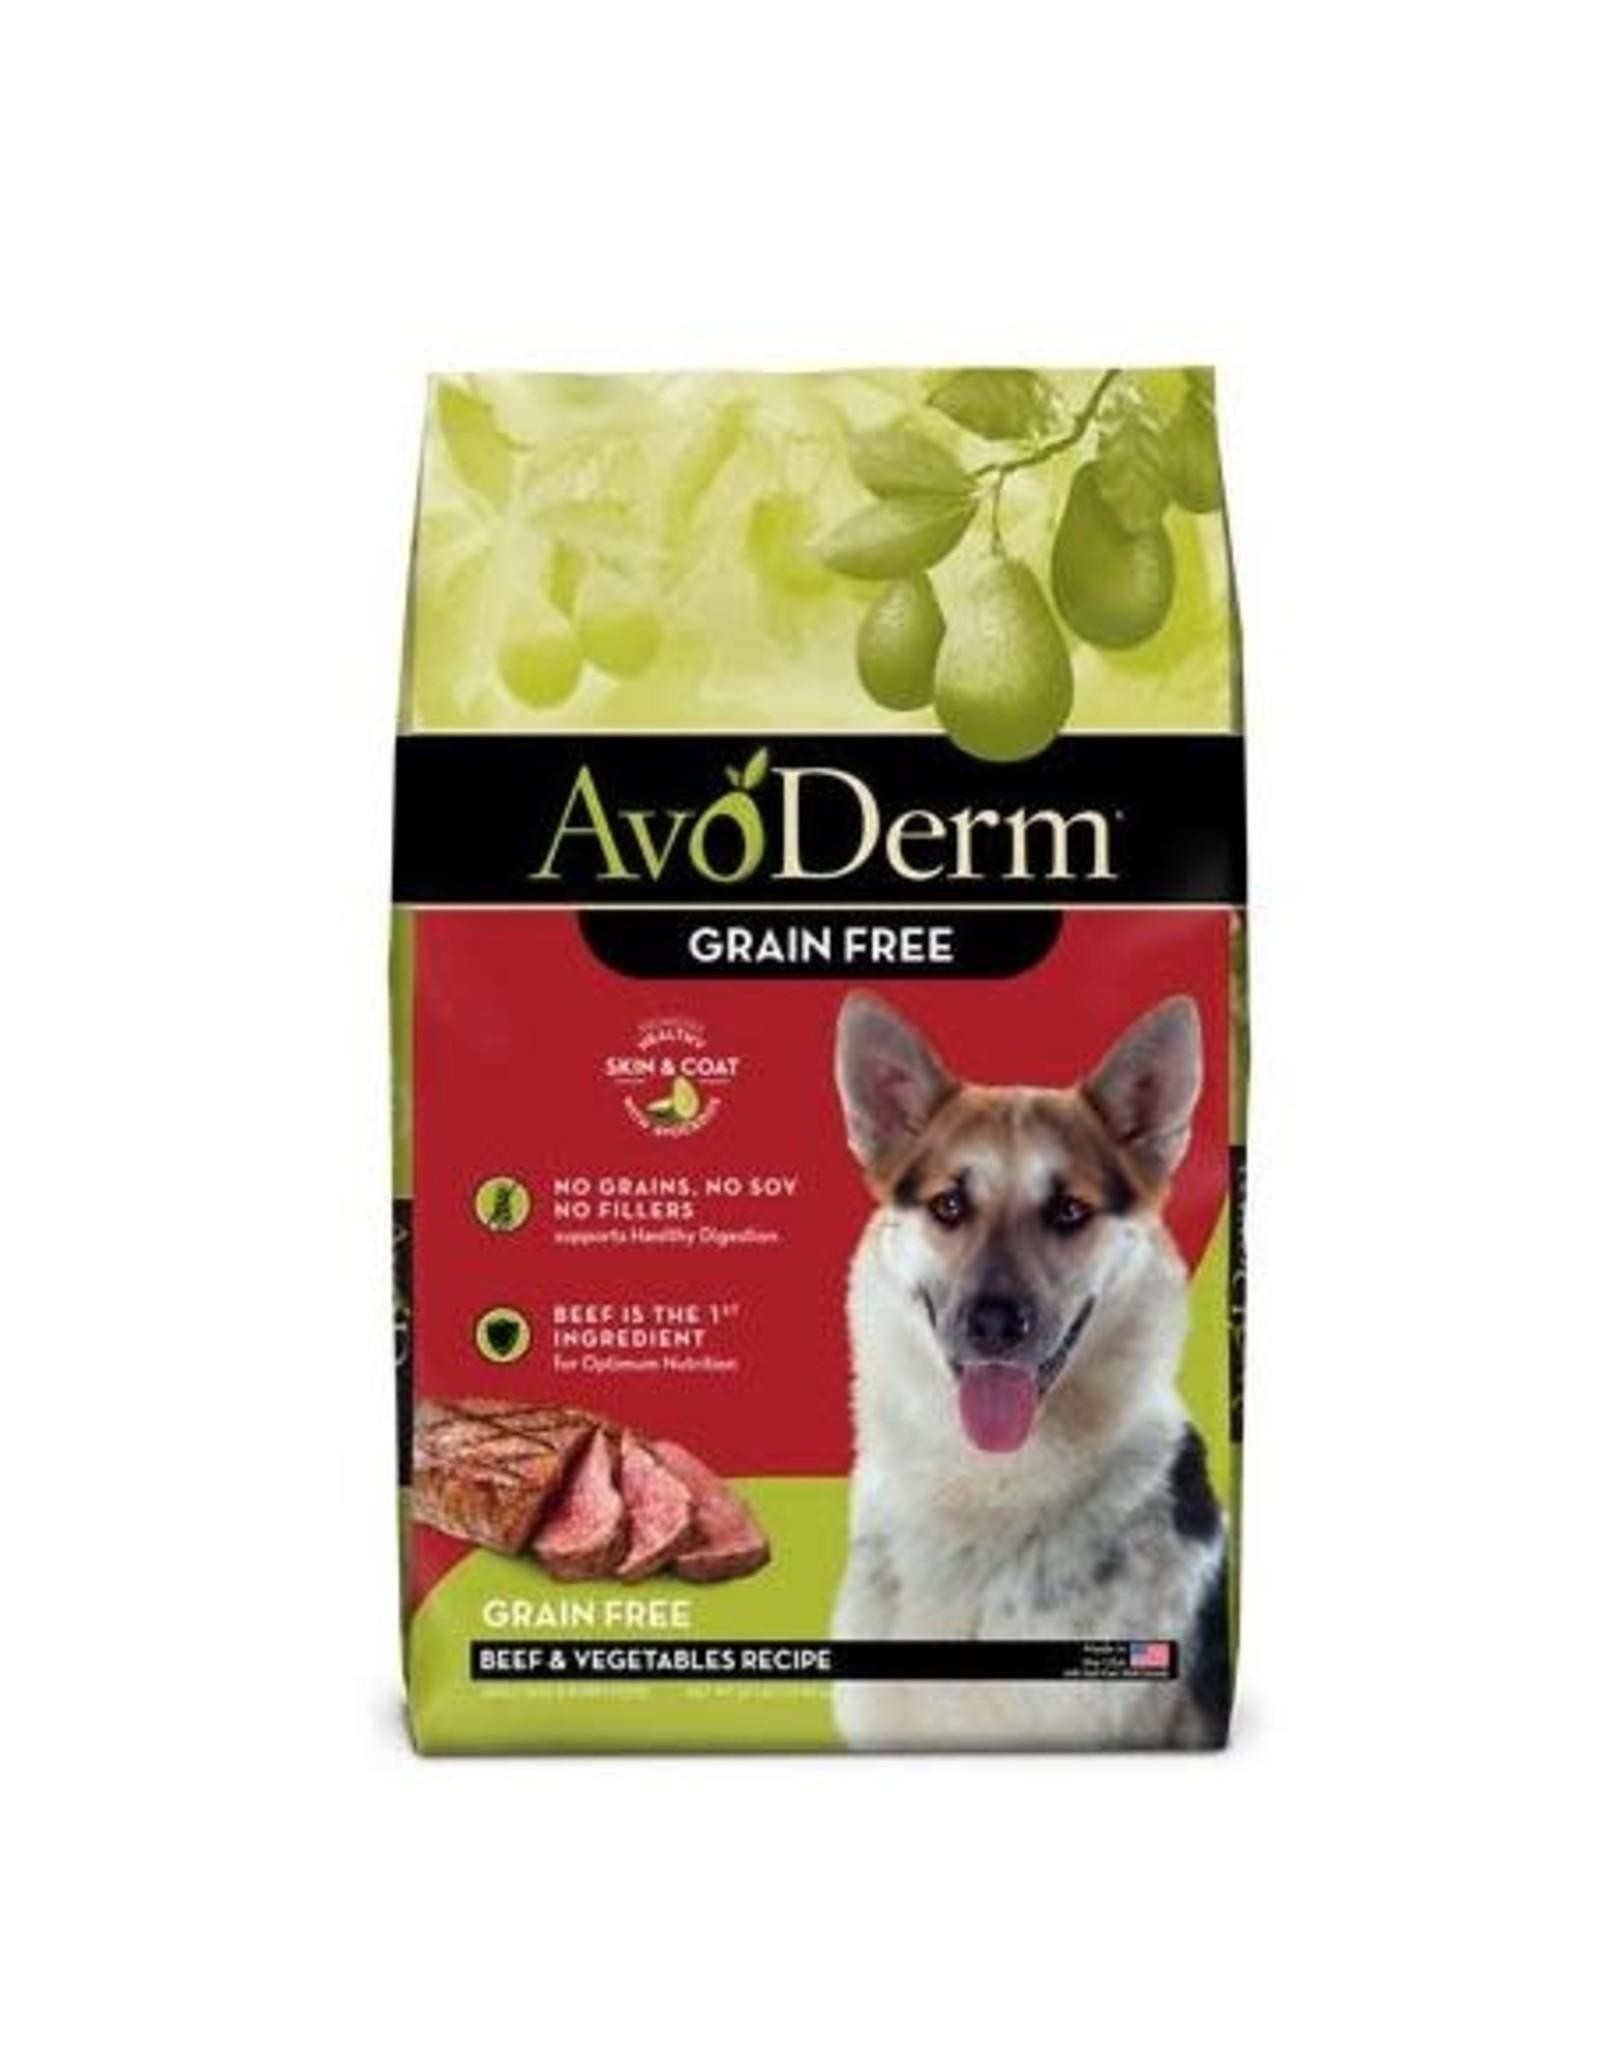 AvoDerm Grain Free Dry Dog Food